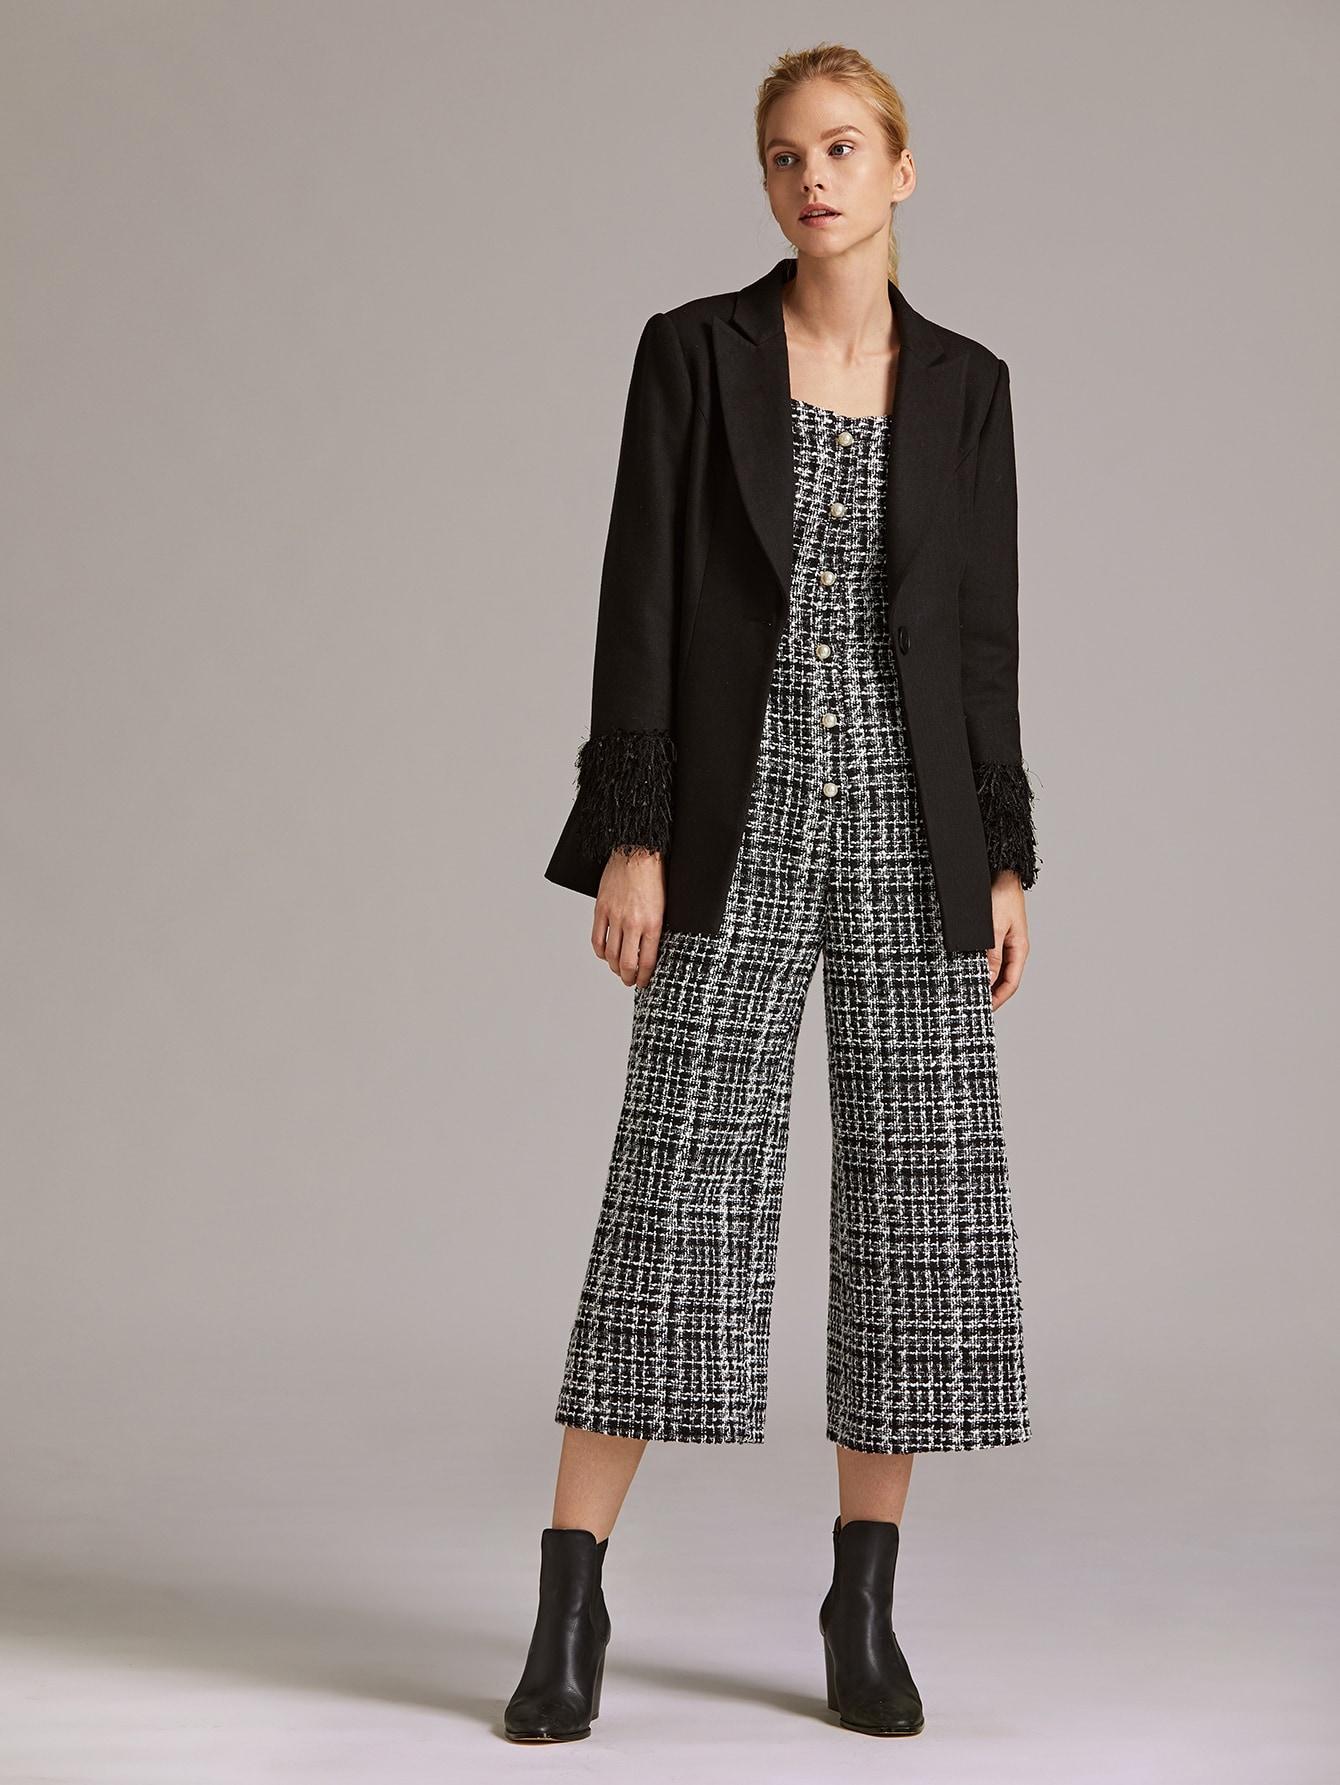 Notched Collar Faux Fur Cuff Blazer, Denisa, SheIn, Black  - buy with discount